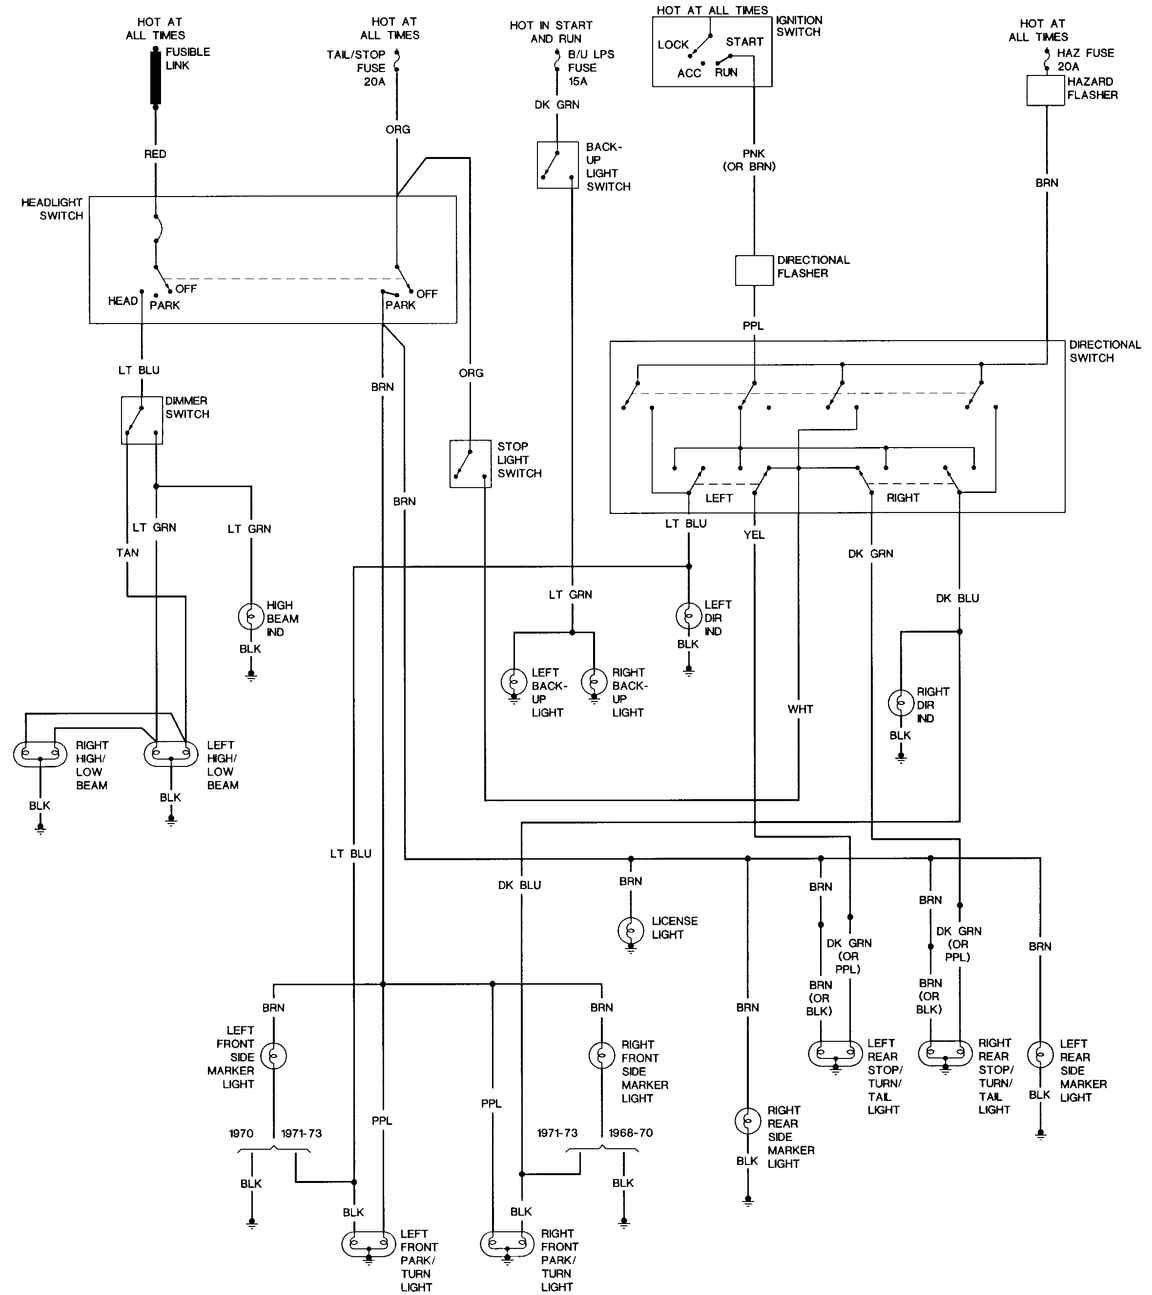 Diagram 1971 Nova Headlight Switch Wiring Diagram Full Version Hd Quality Wiring Diagram Skematik110isi Gsdportotorres It